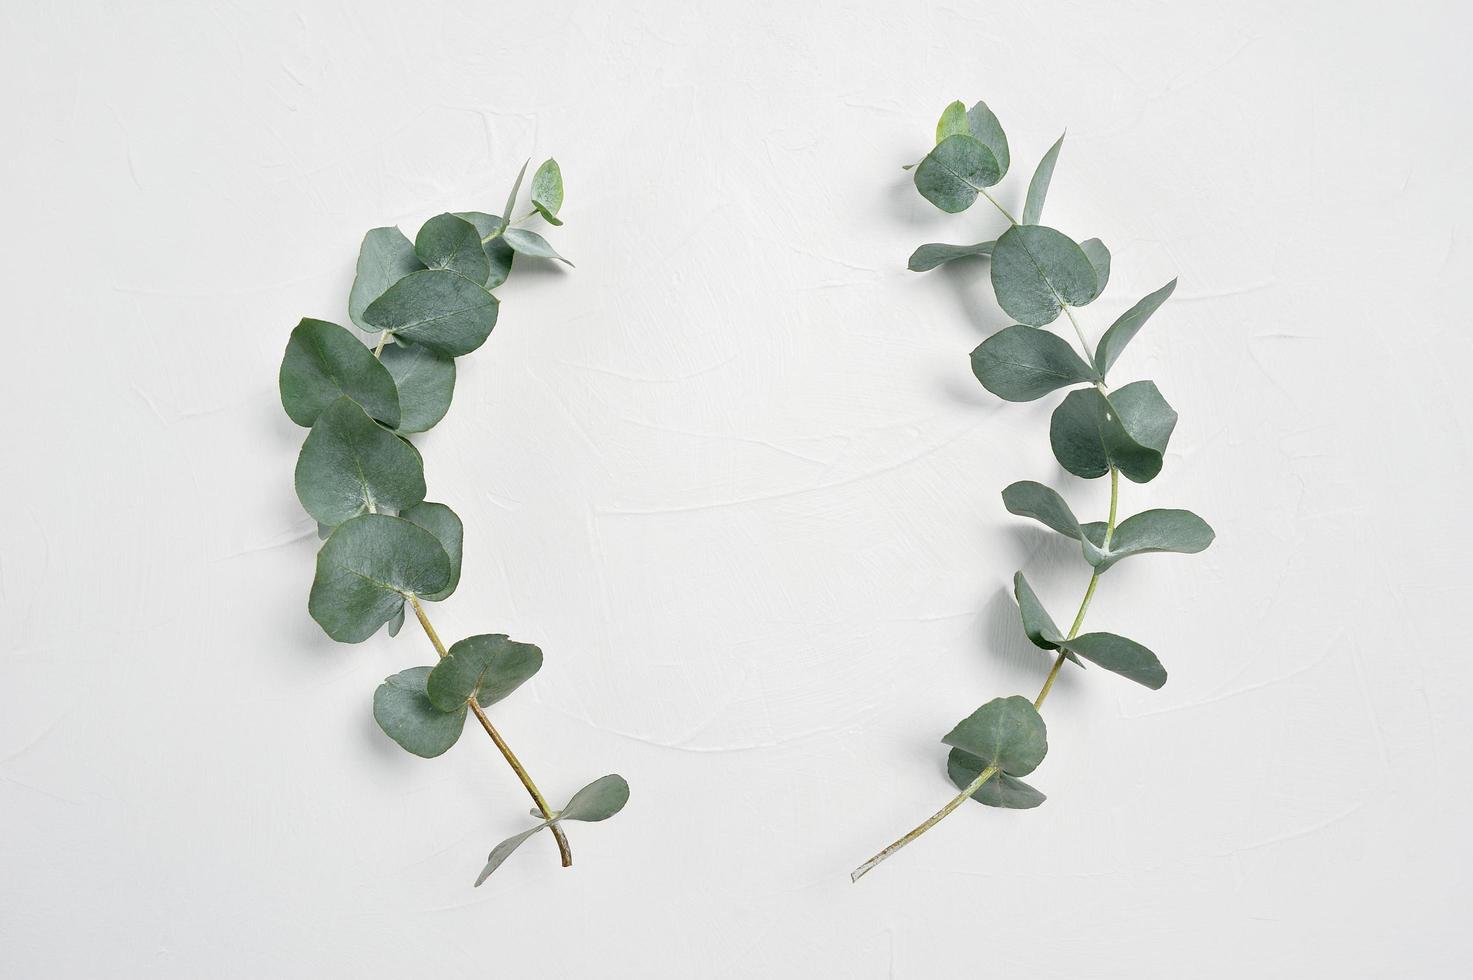 Eucalyptus leaves on stems photo